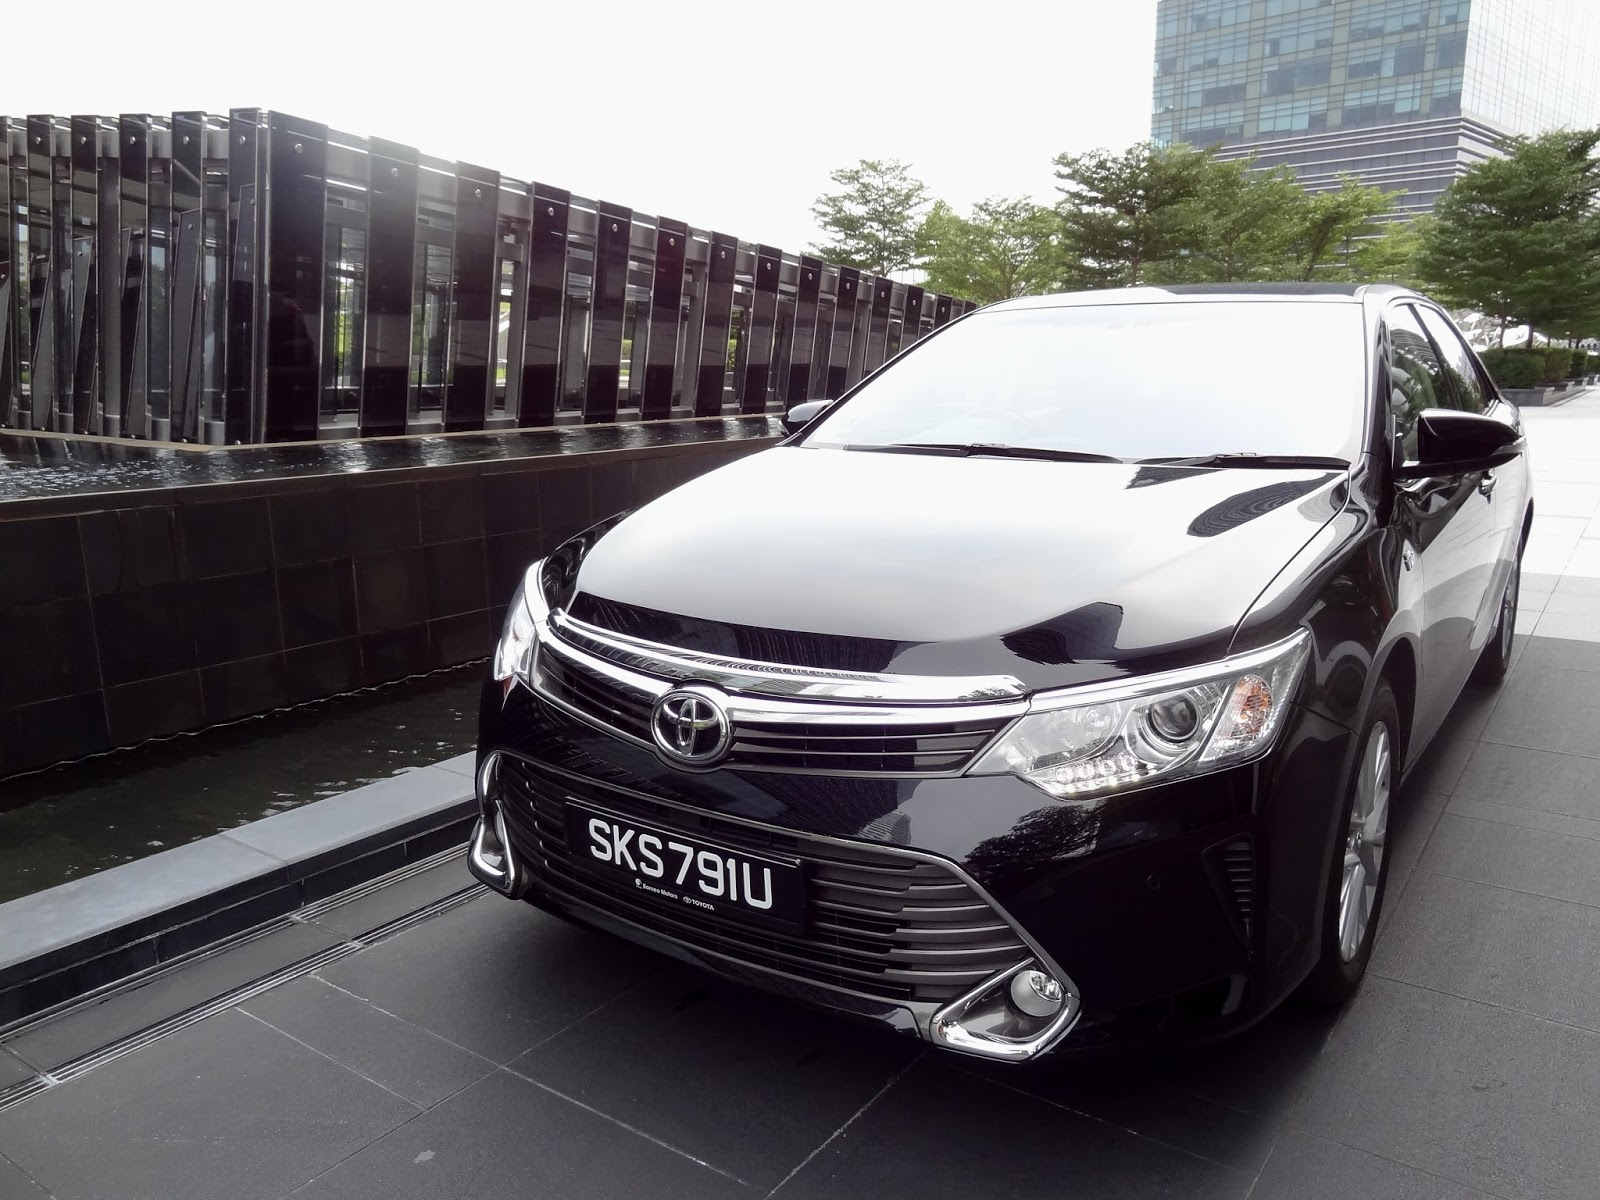 Toyota Camry - Shaun Owyeong - 1